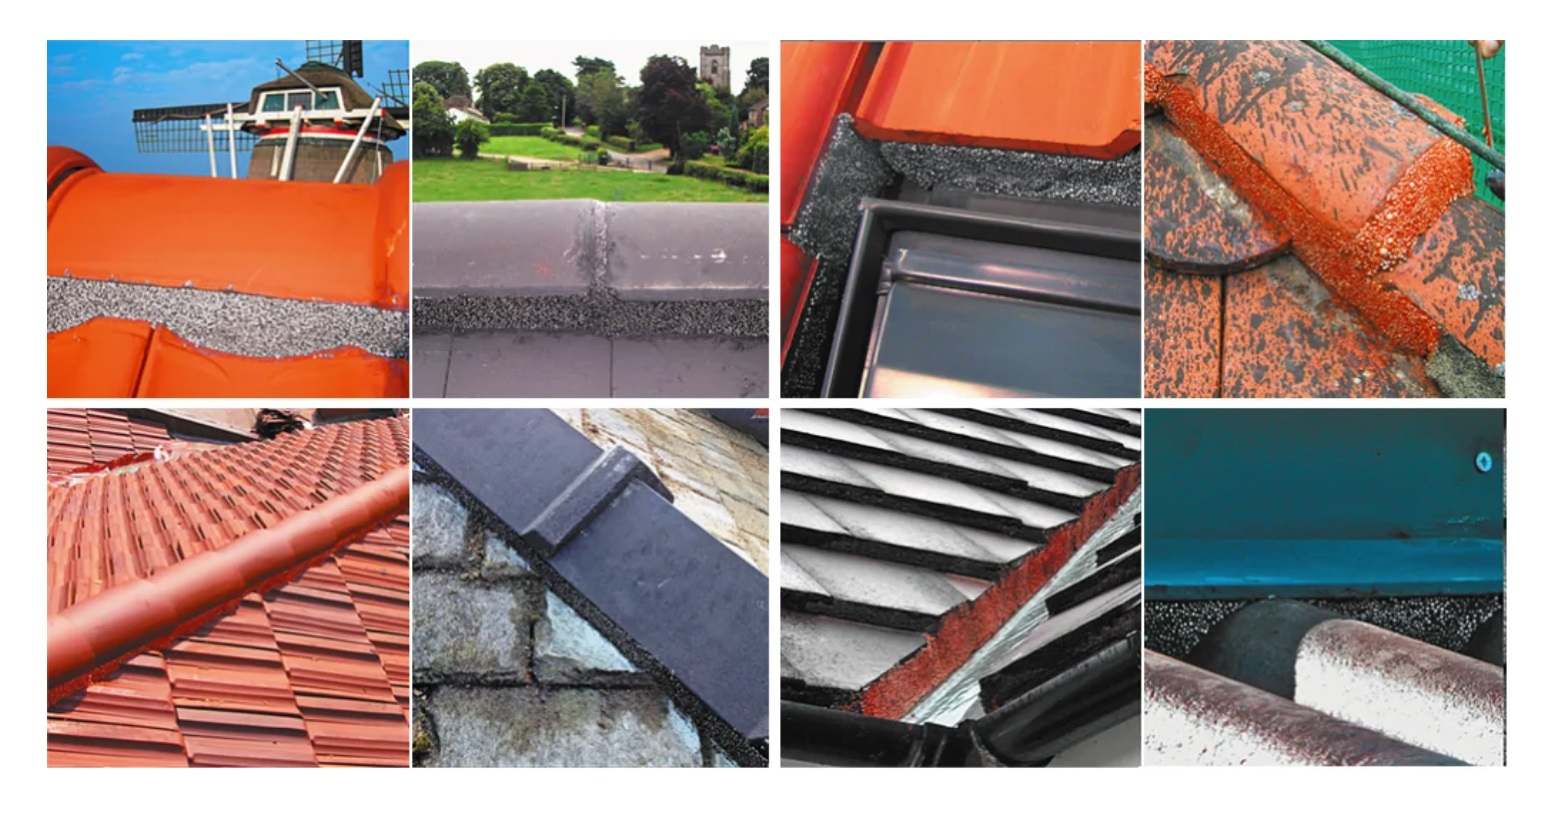 Flexible Flashing Roof Tiles